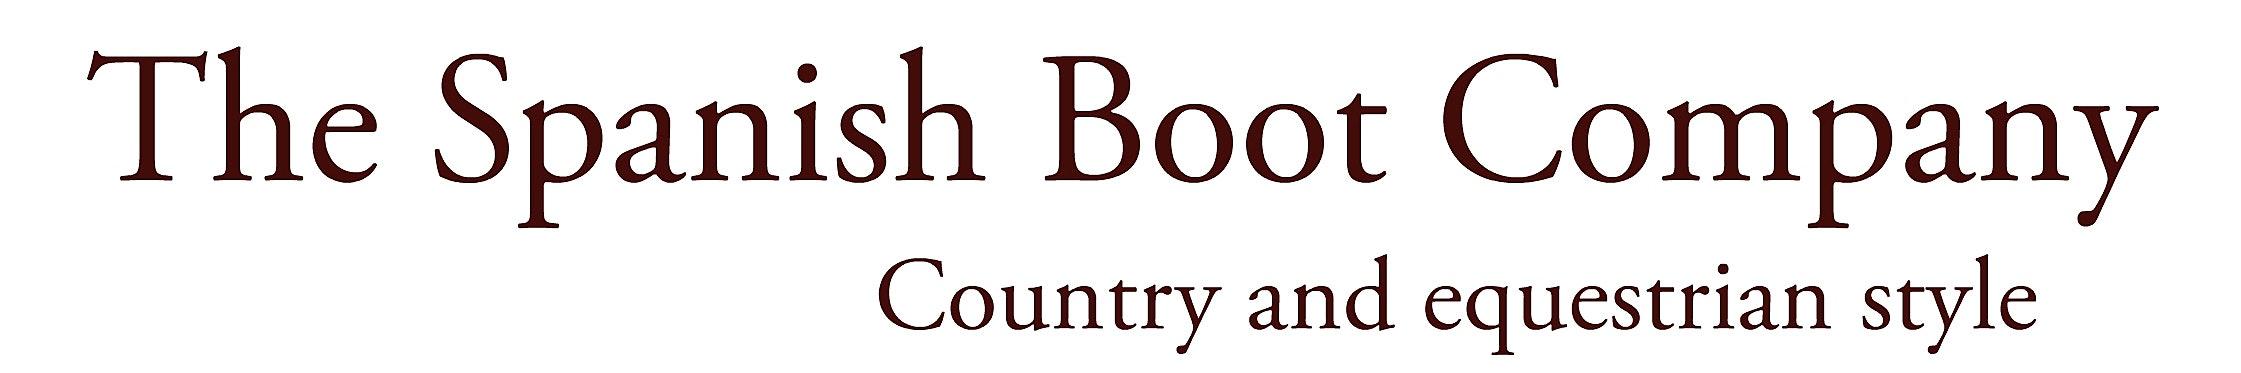 Sbc logo aubergine